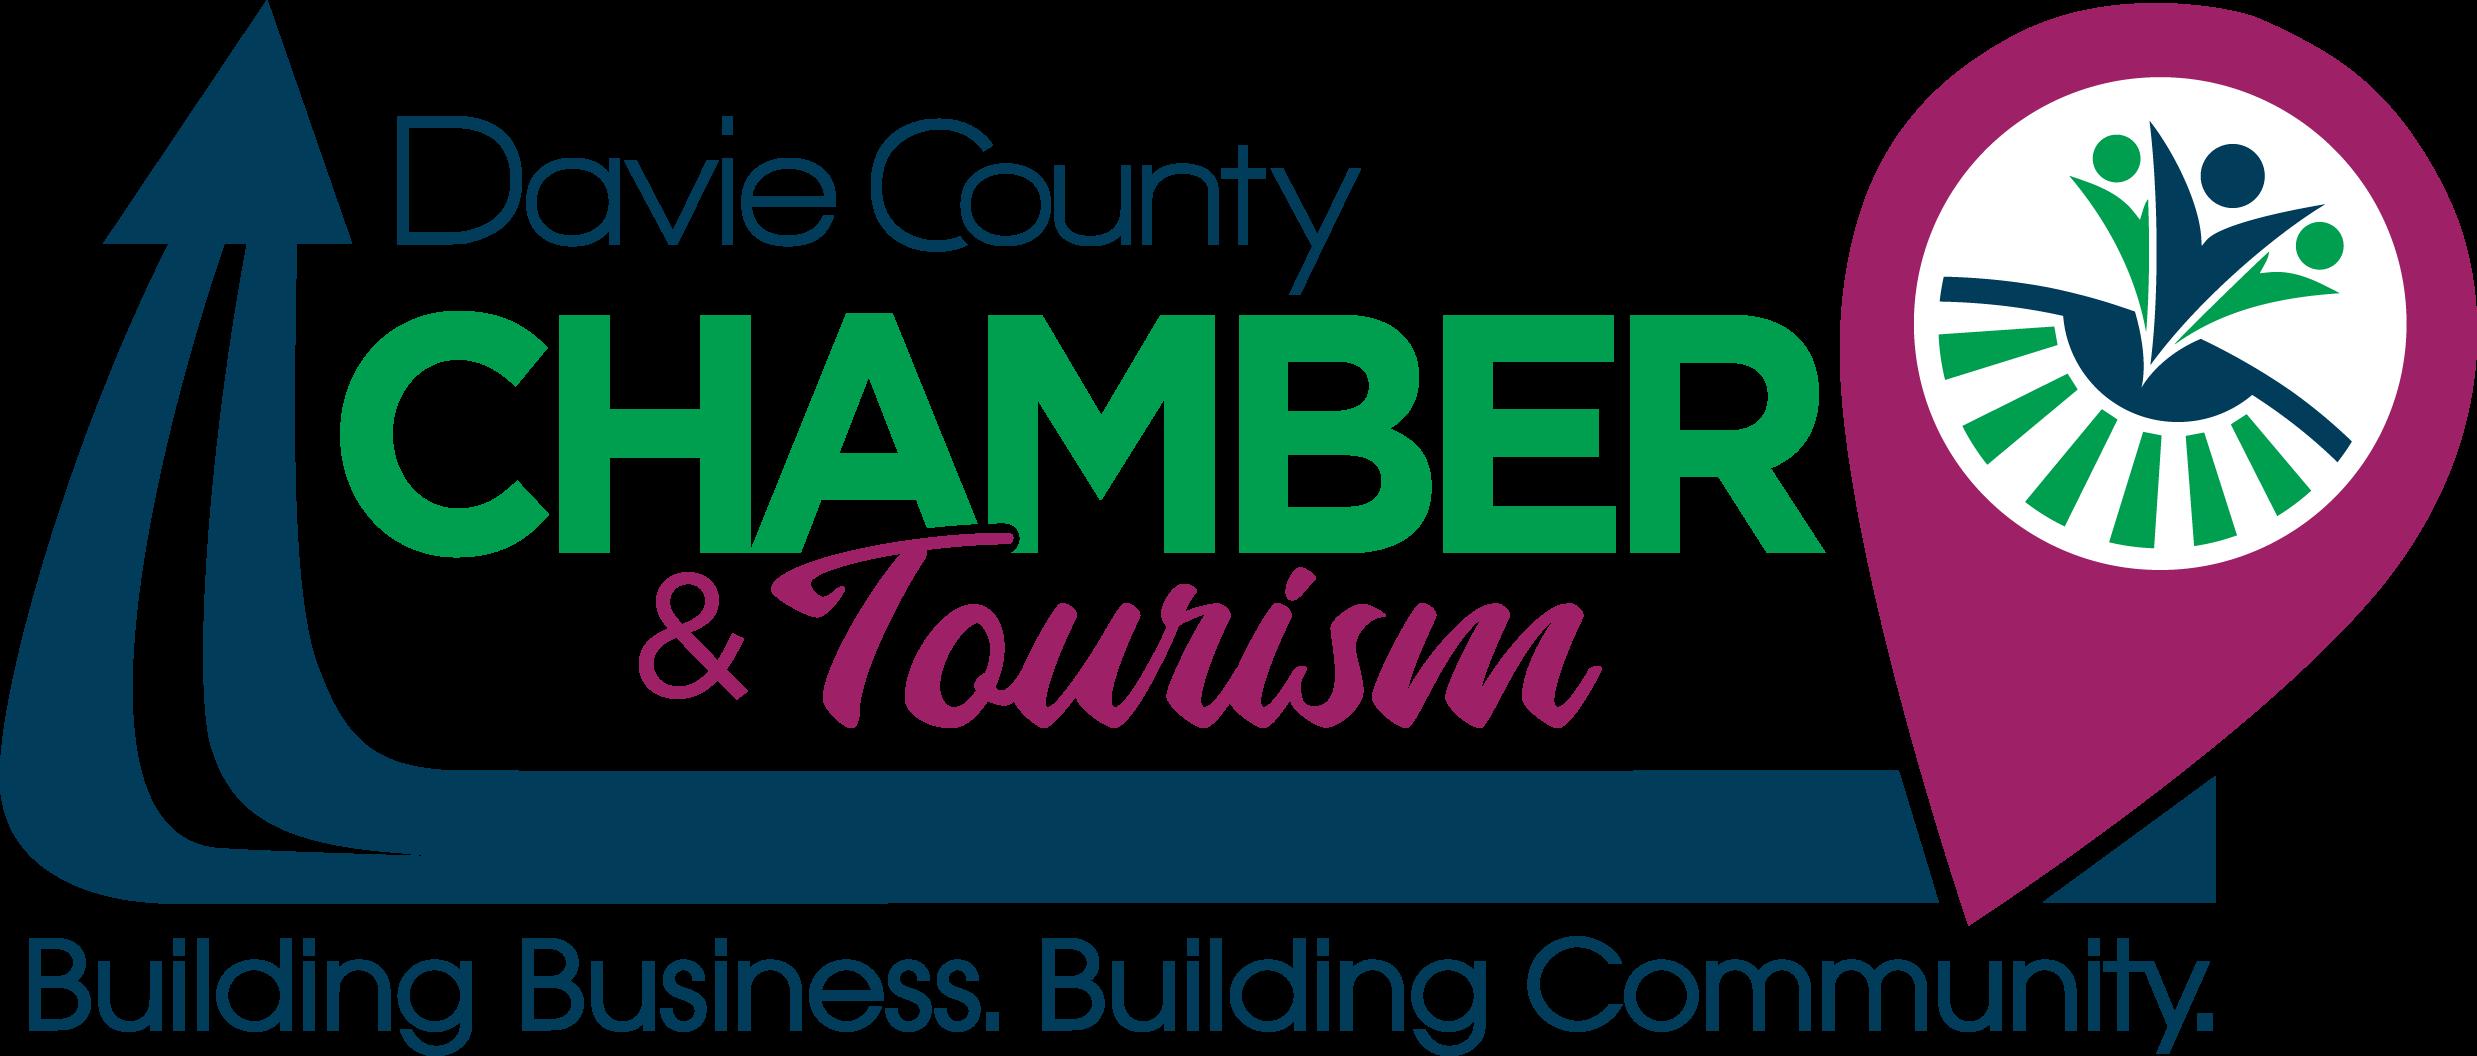 Davie County Chamber of Commerce & Visitor Center